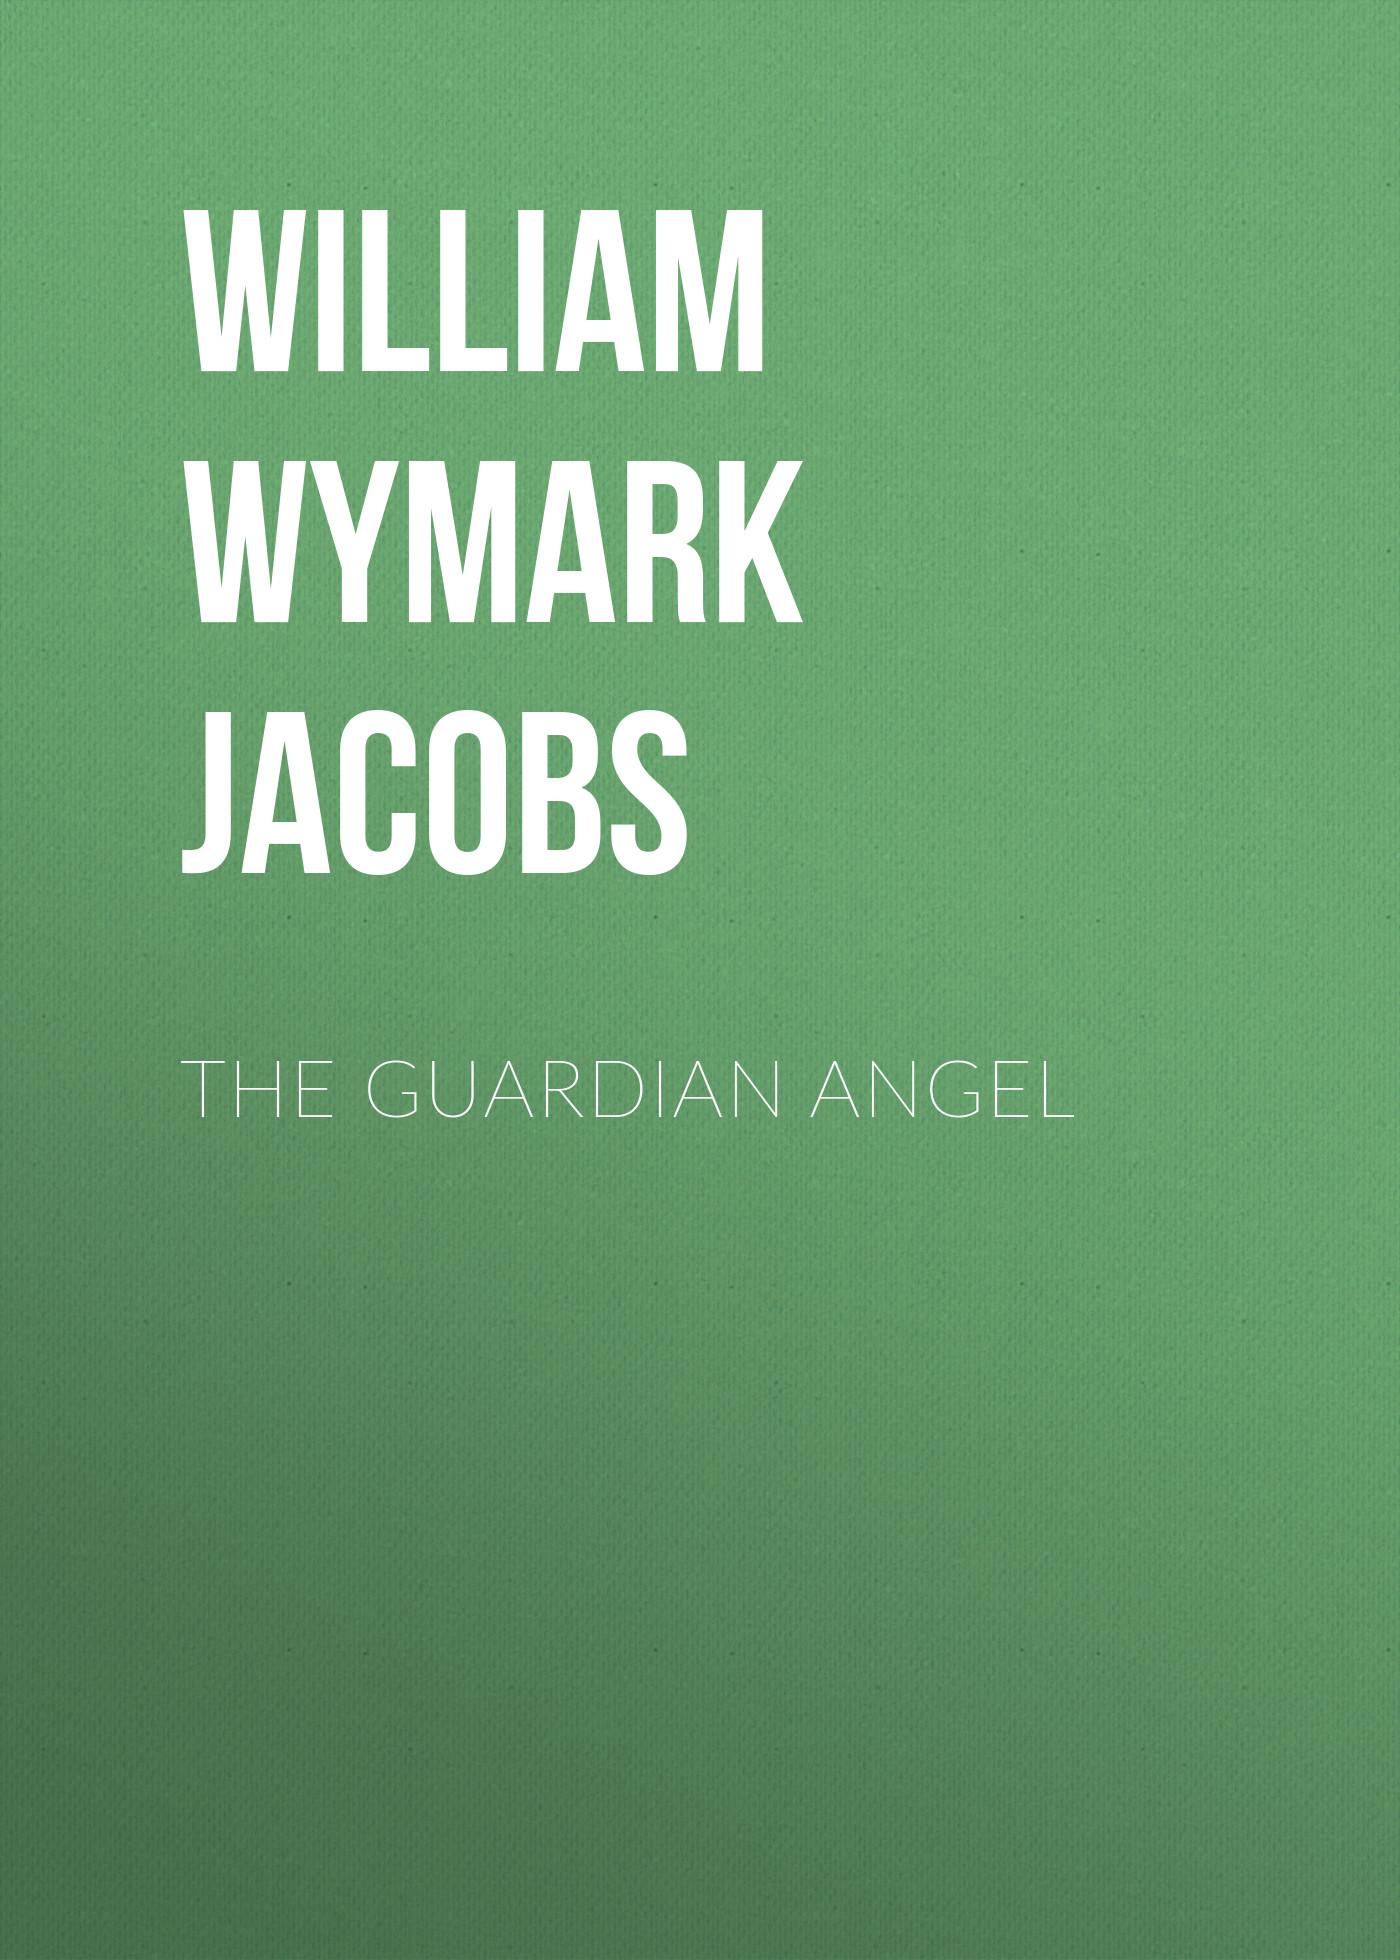 все цены на William Wymark Jacobs The Guardian Angel онлайн